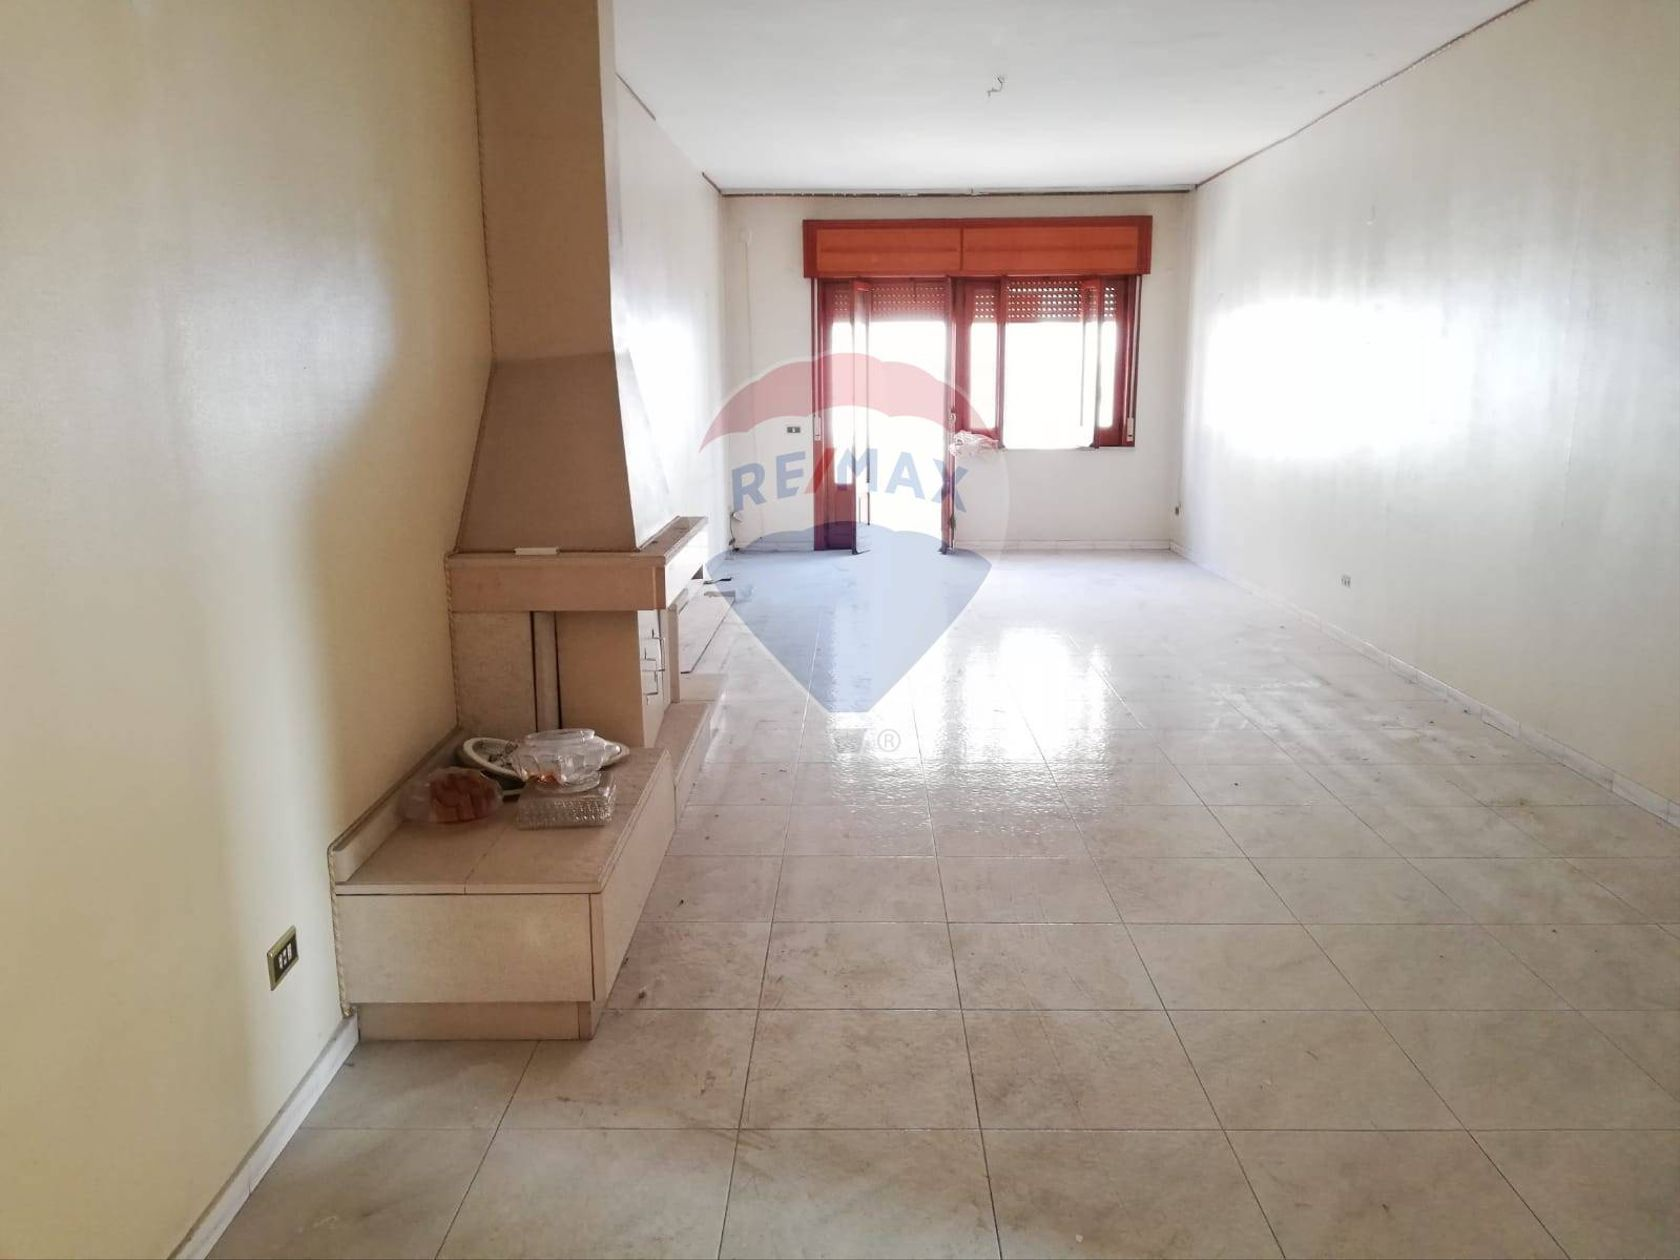 Appartamento Zona Centro, Afragola, NA Affitto - Foto 3